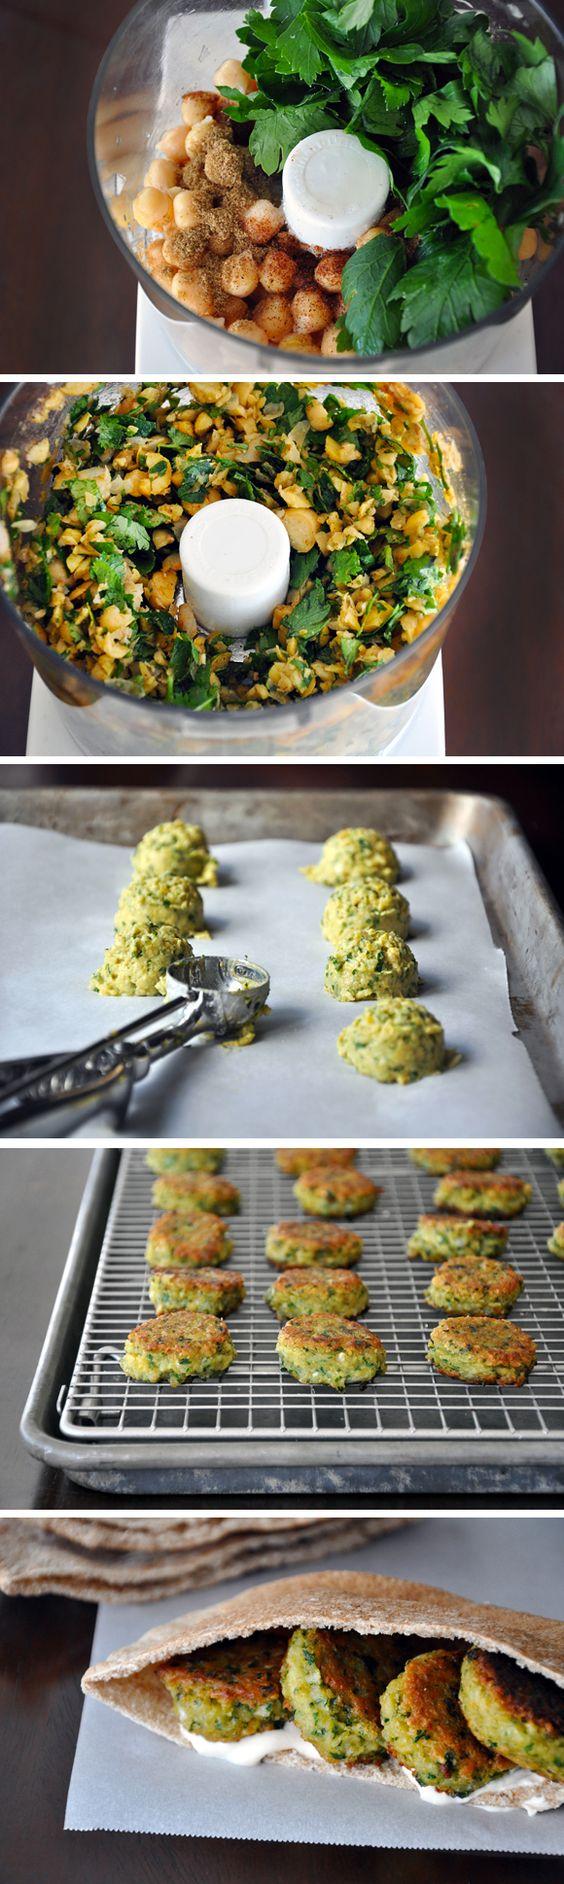 Homemade Falafel with Tahini Sauce from justataste.com #recipe